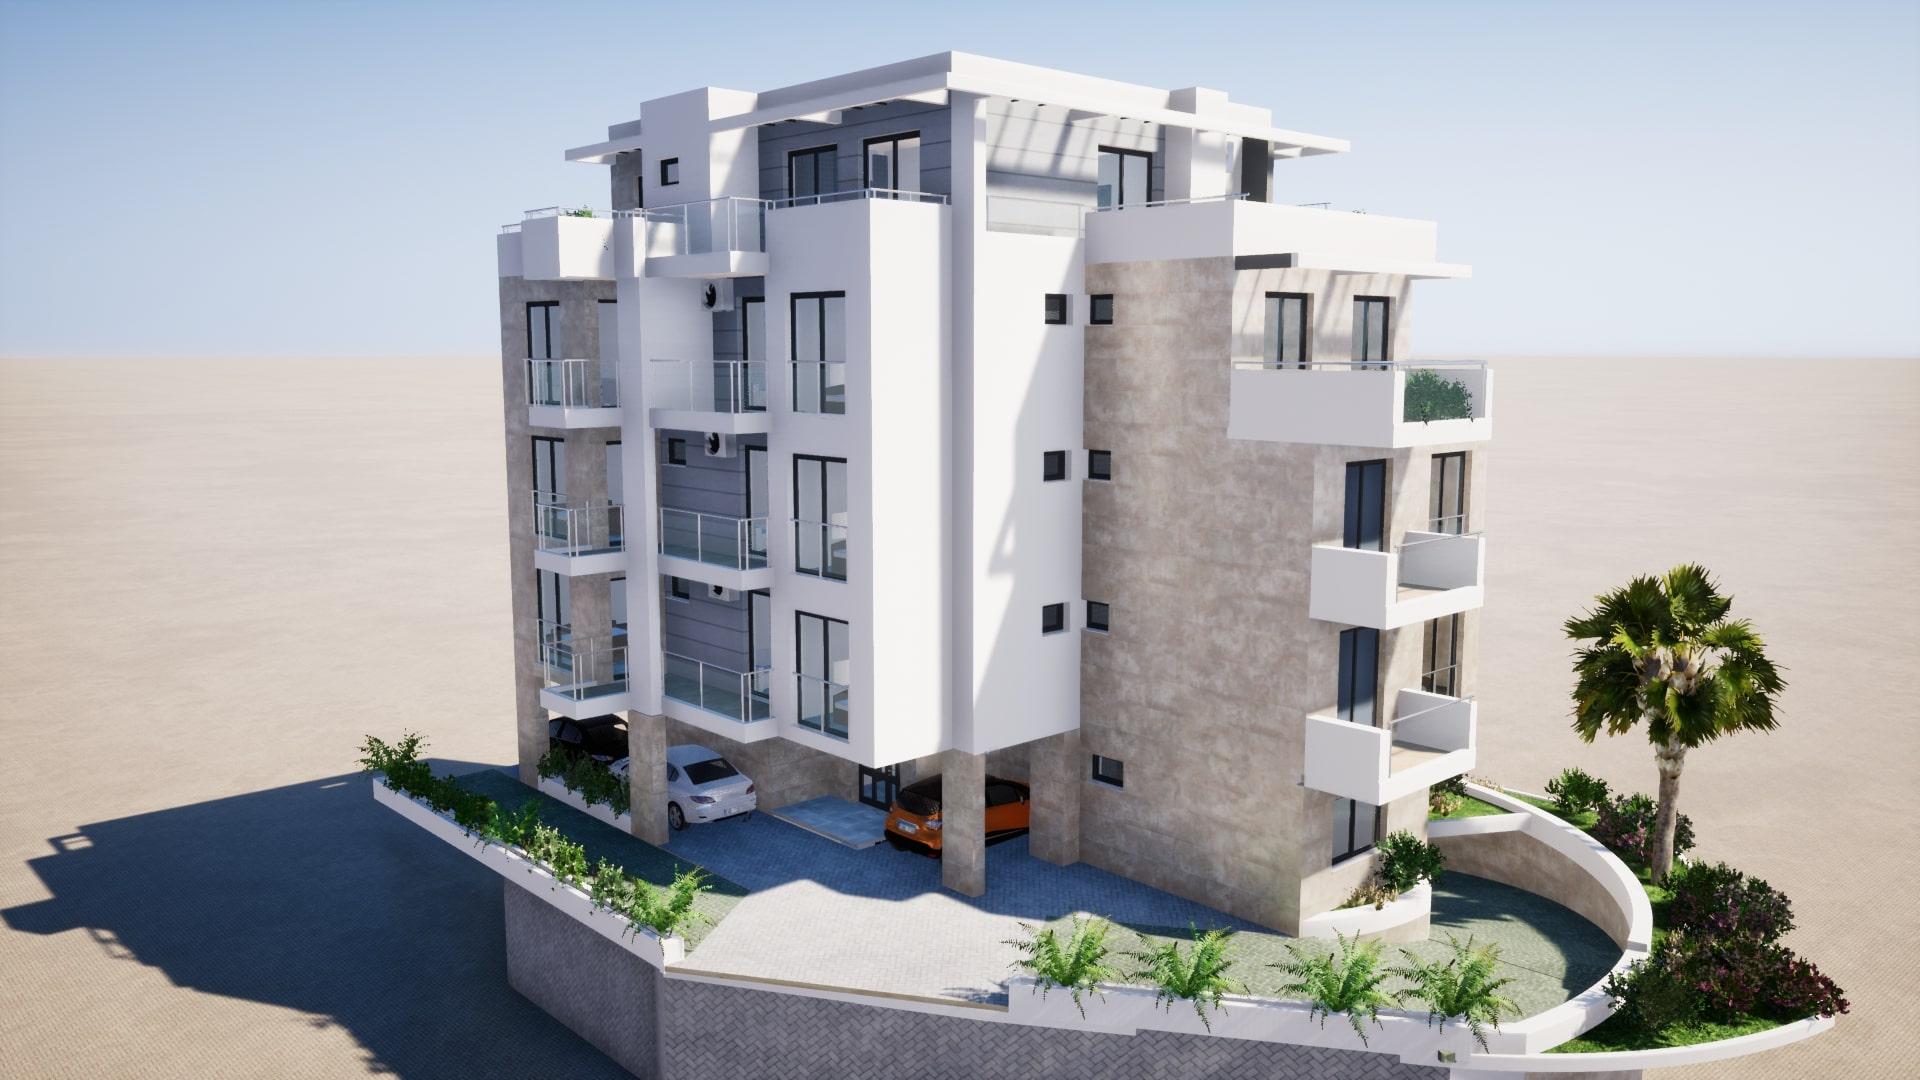 Projekt:<b>                                             Apartmanski objekat Rozino 2                                             </b>